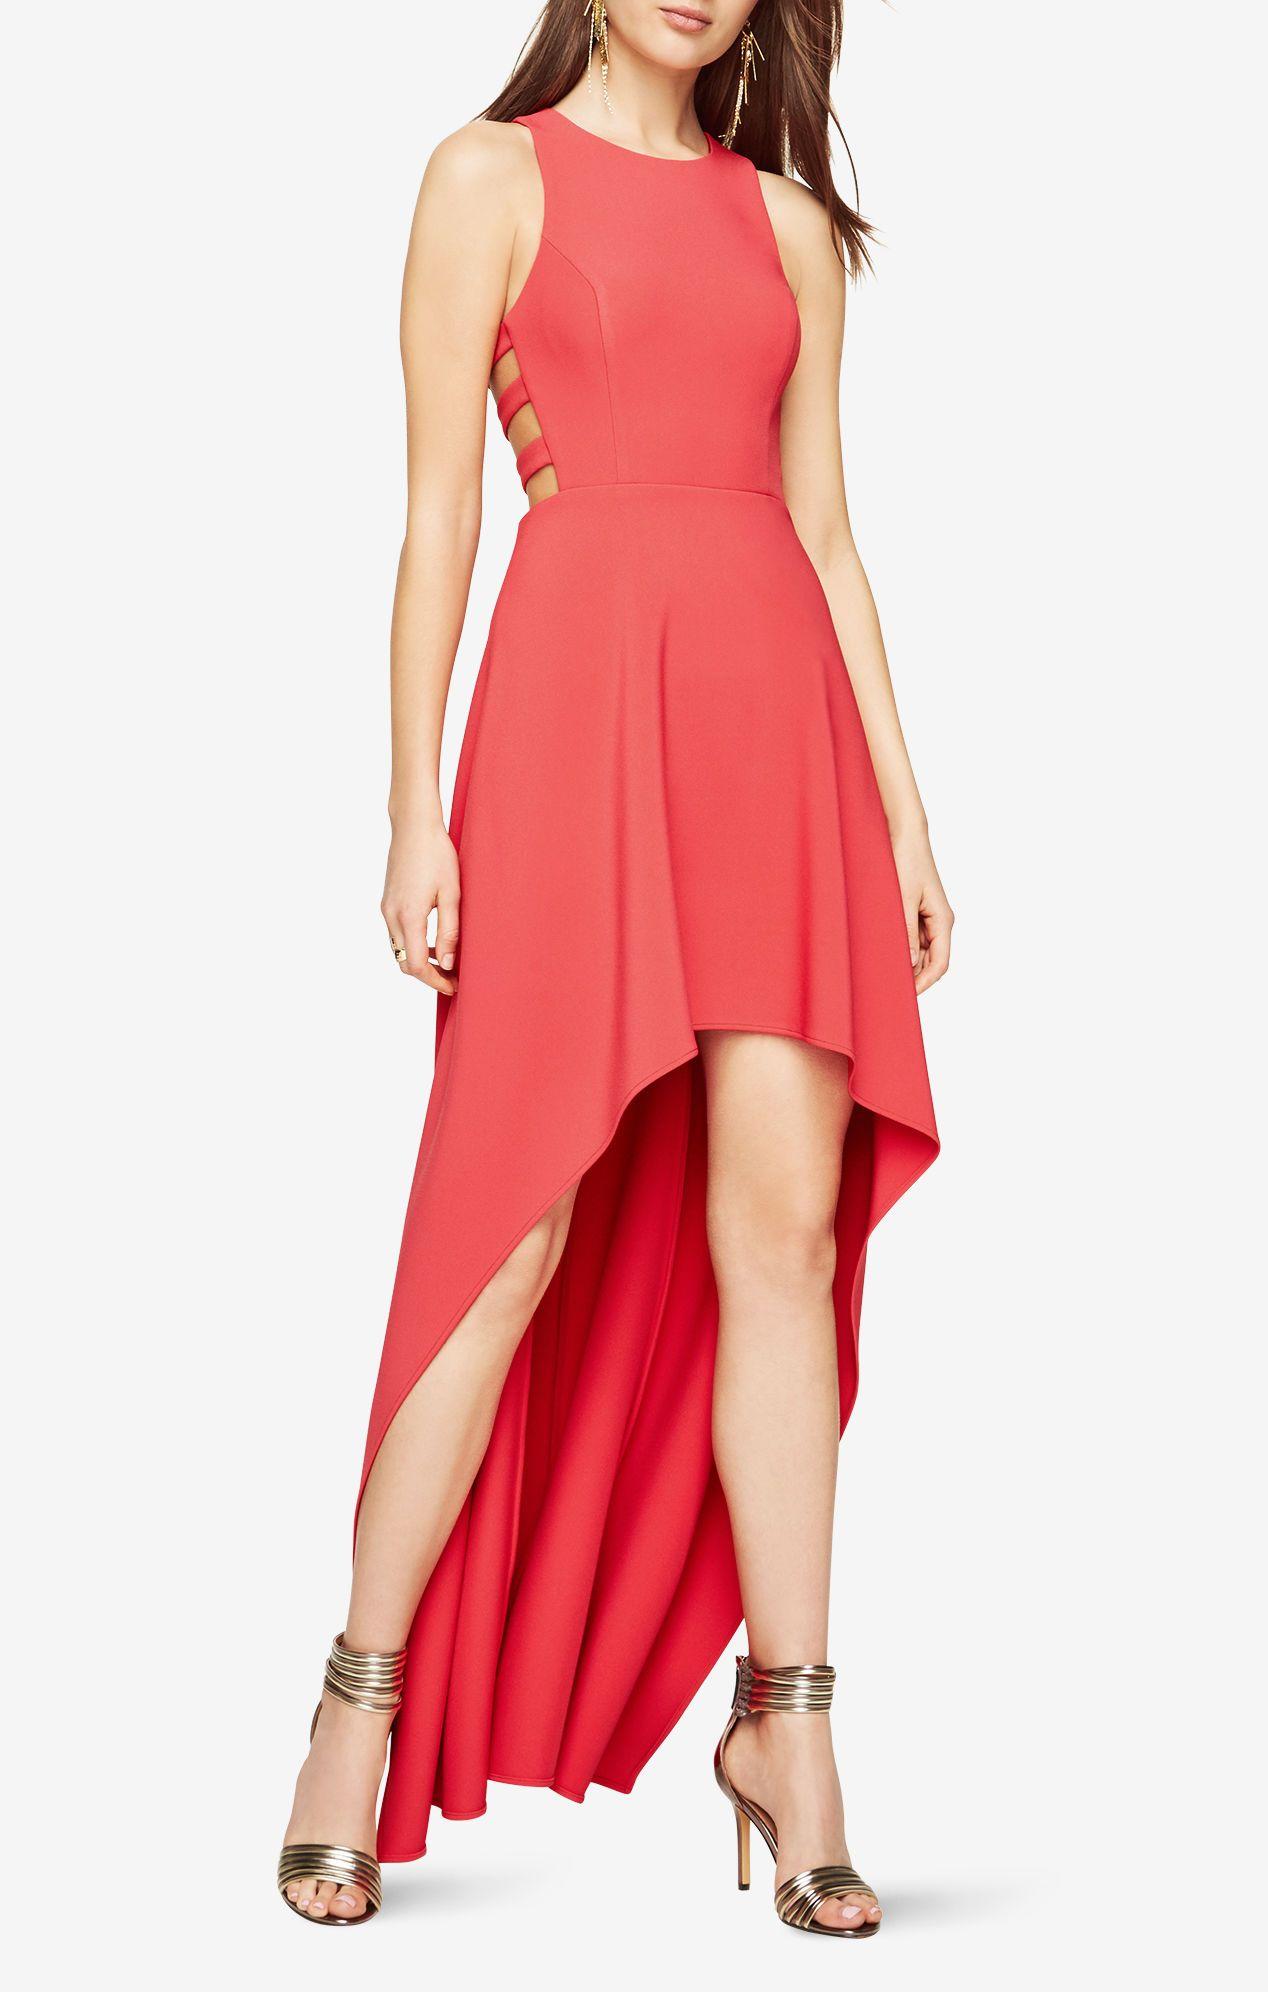 Rosalyn Cutout High Low Dress Bcbg 338 High Low Cocktail Dress Red High Low Dress Bcbg Cocktail Dress